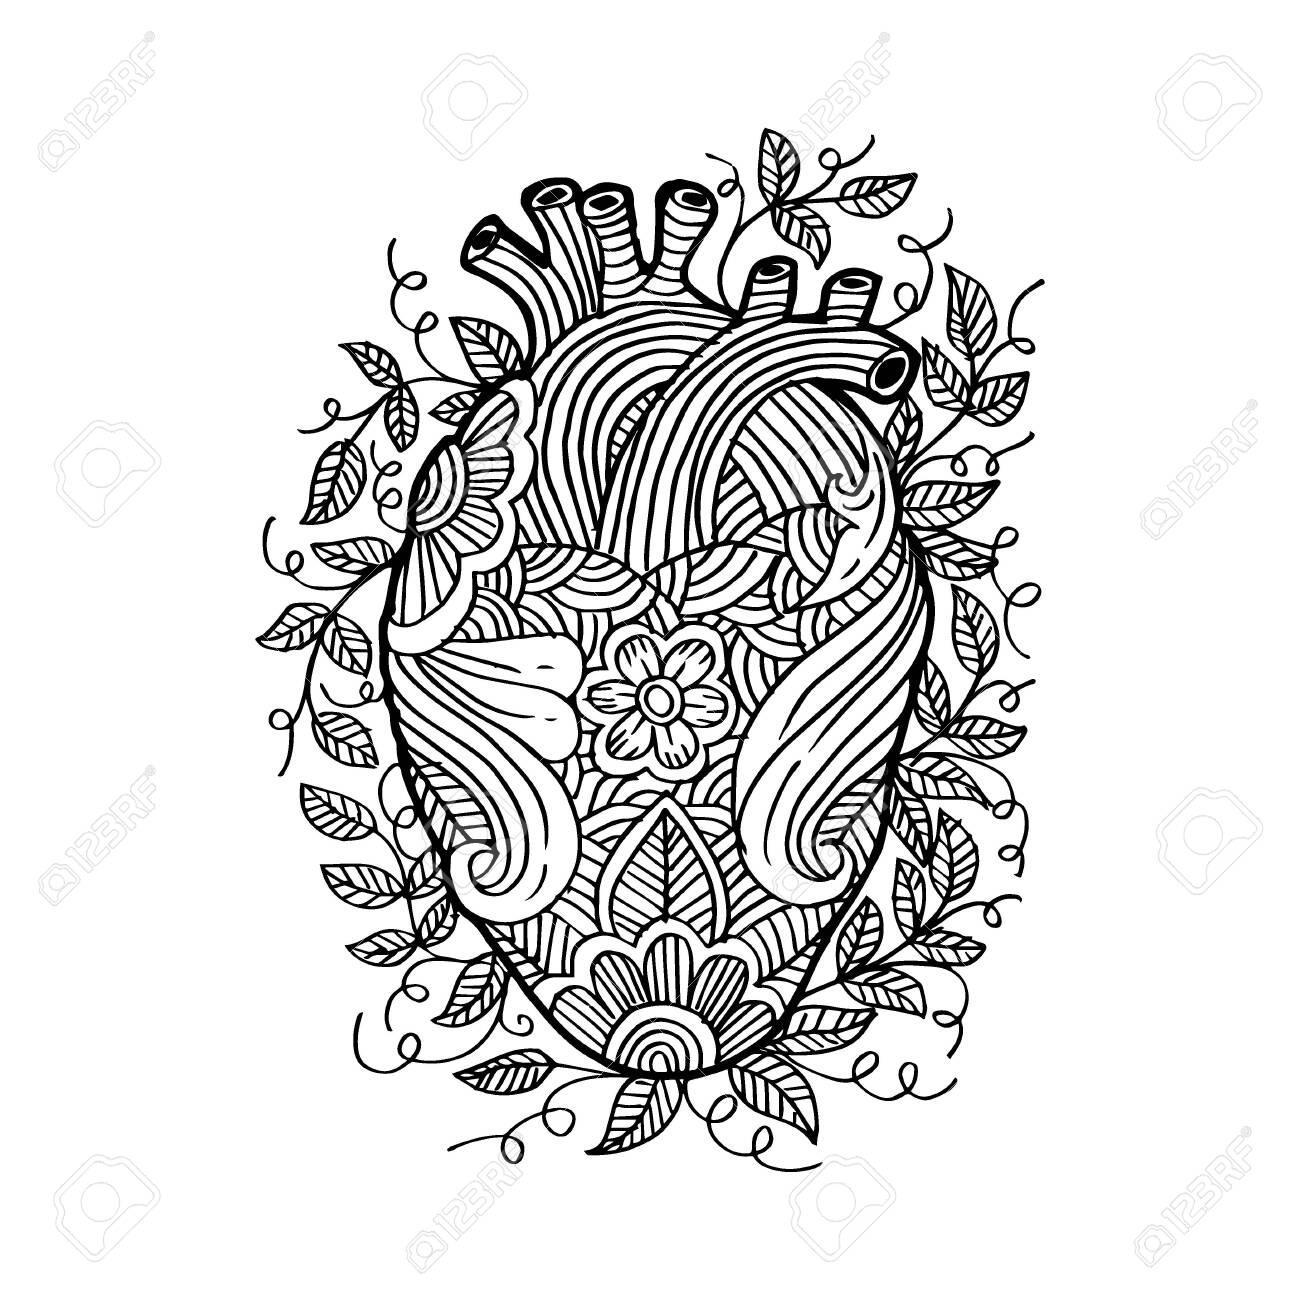 Hand drawing sketch human heart . - 129151050